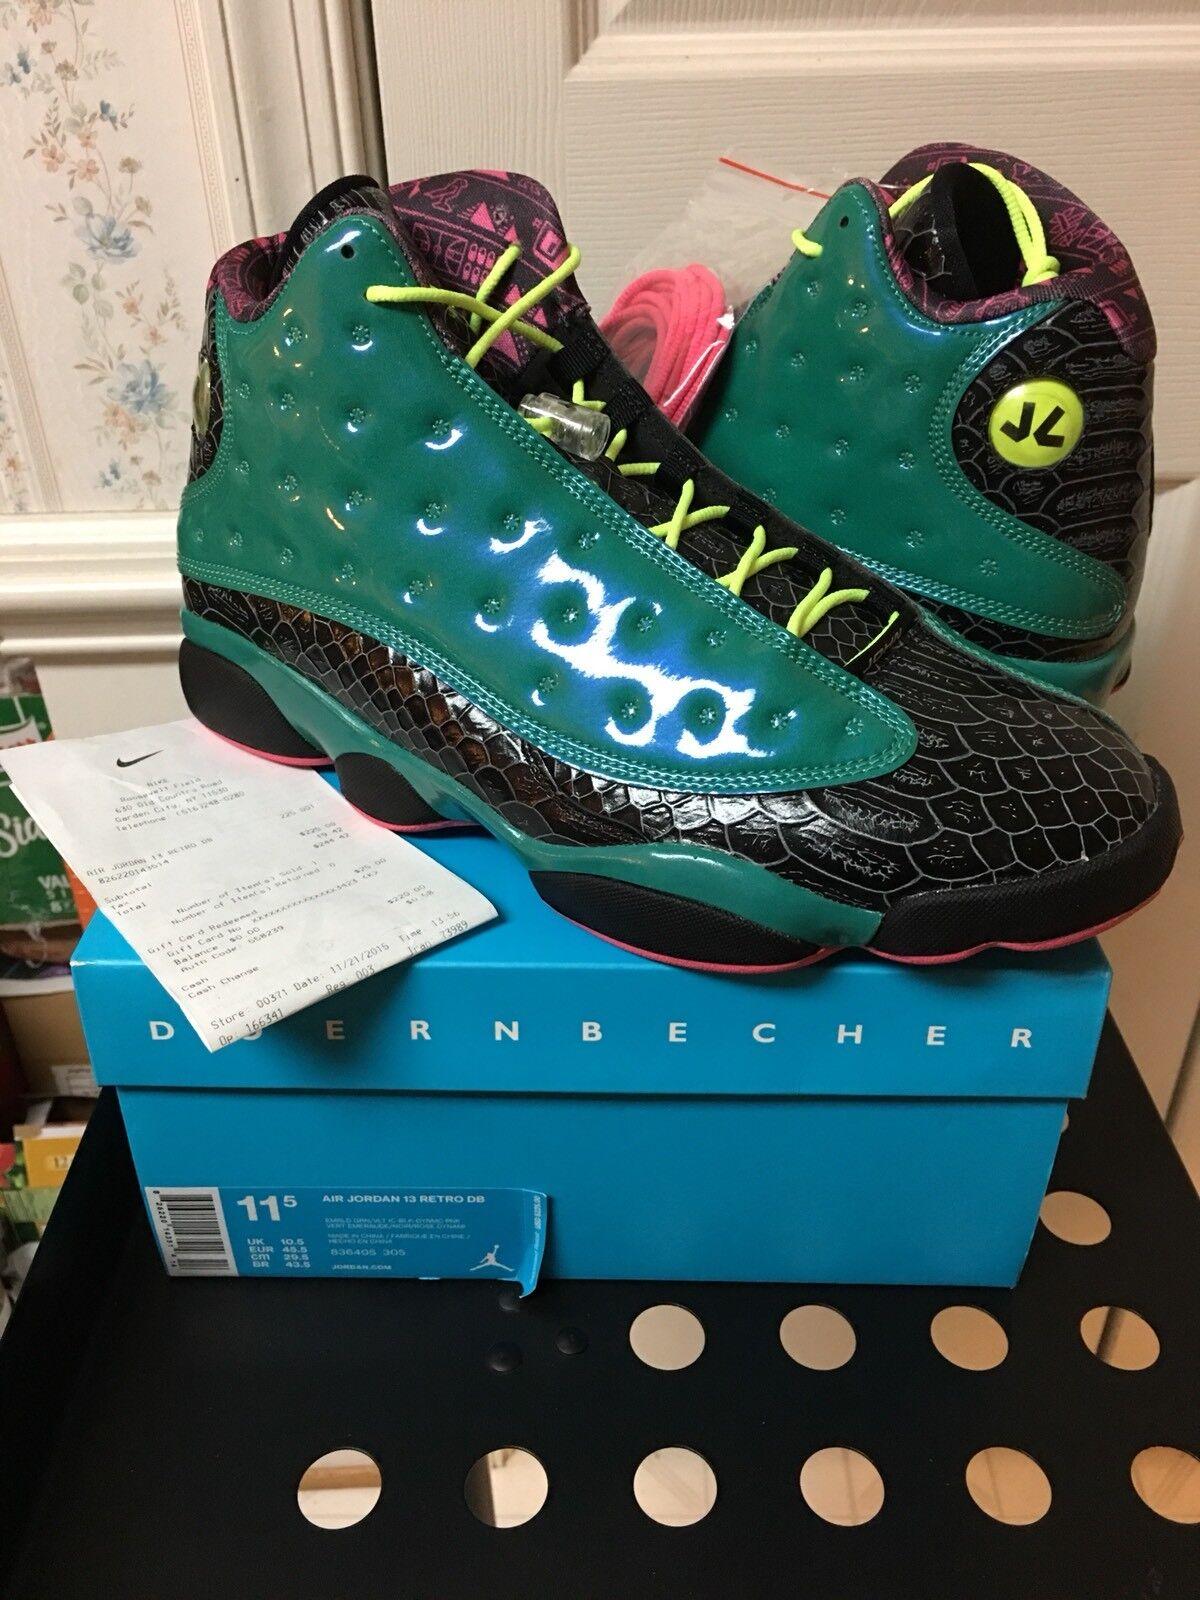 Nike Air Jordan Retro 13 Doernbecher 100% Authentic W Receipt 836405-305